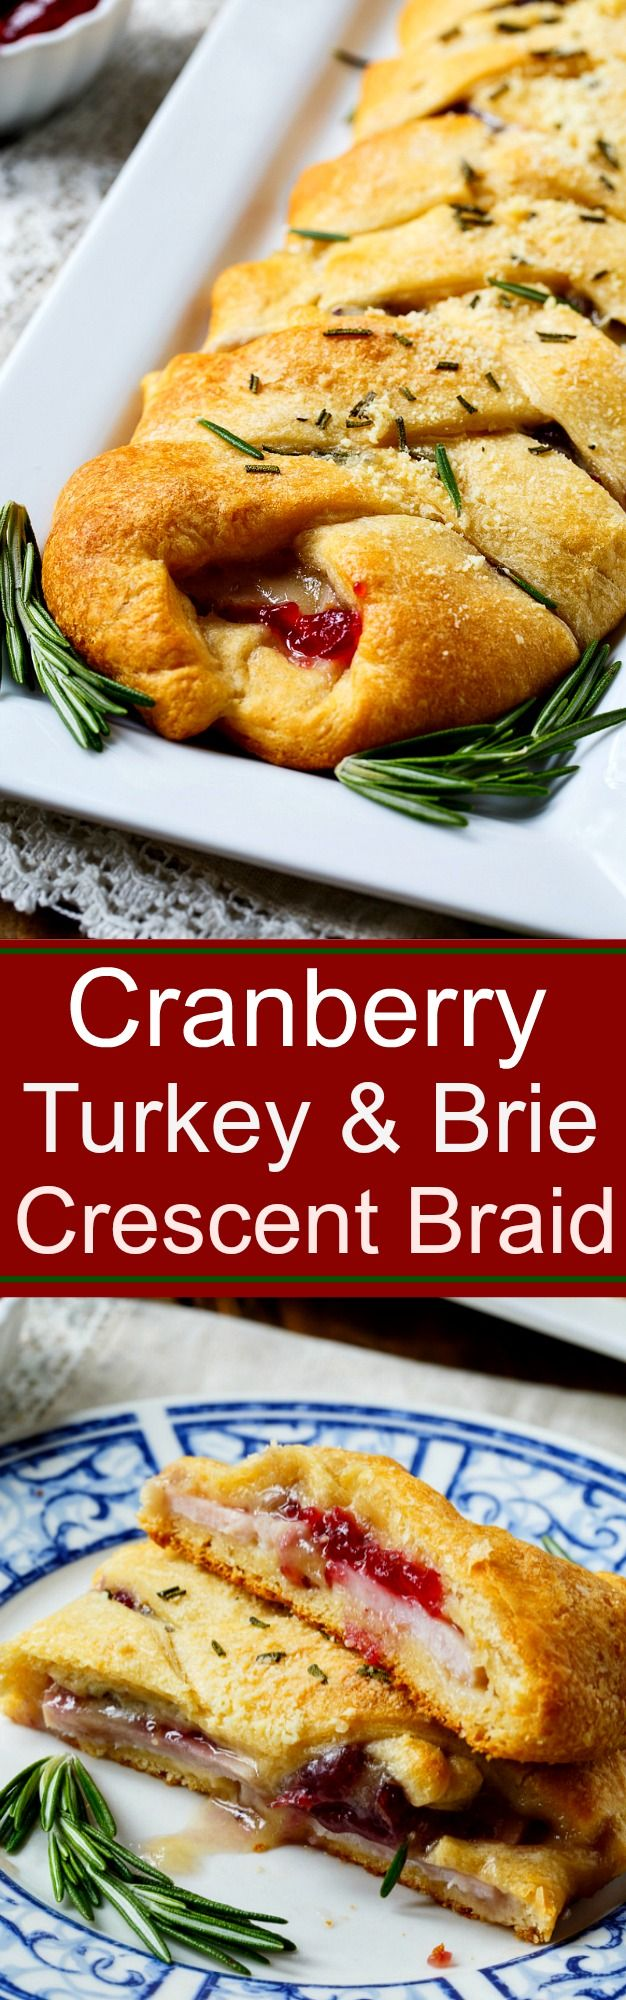 Turkey, Cranberry, and Brie Crescent Braid